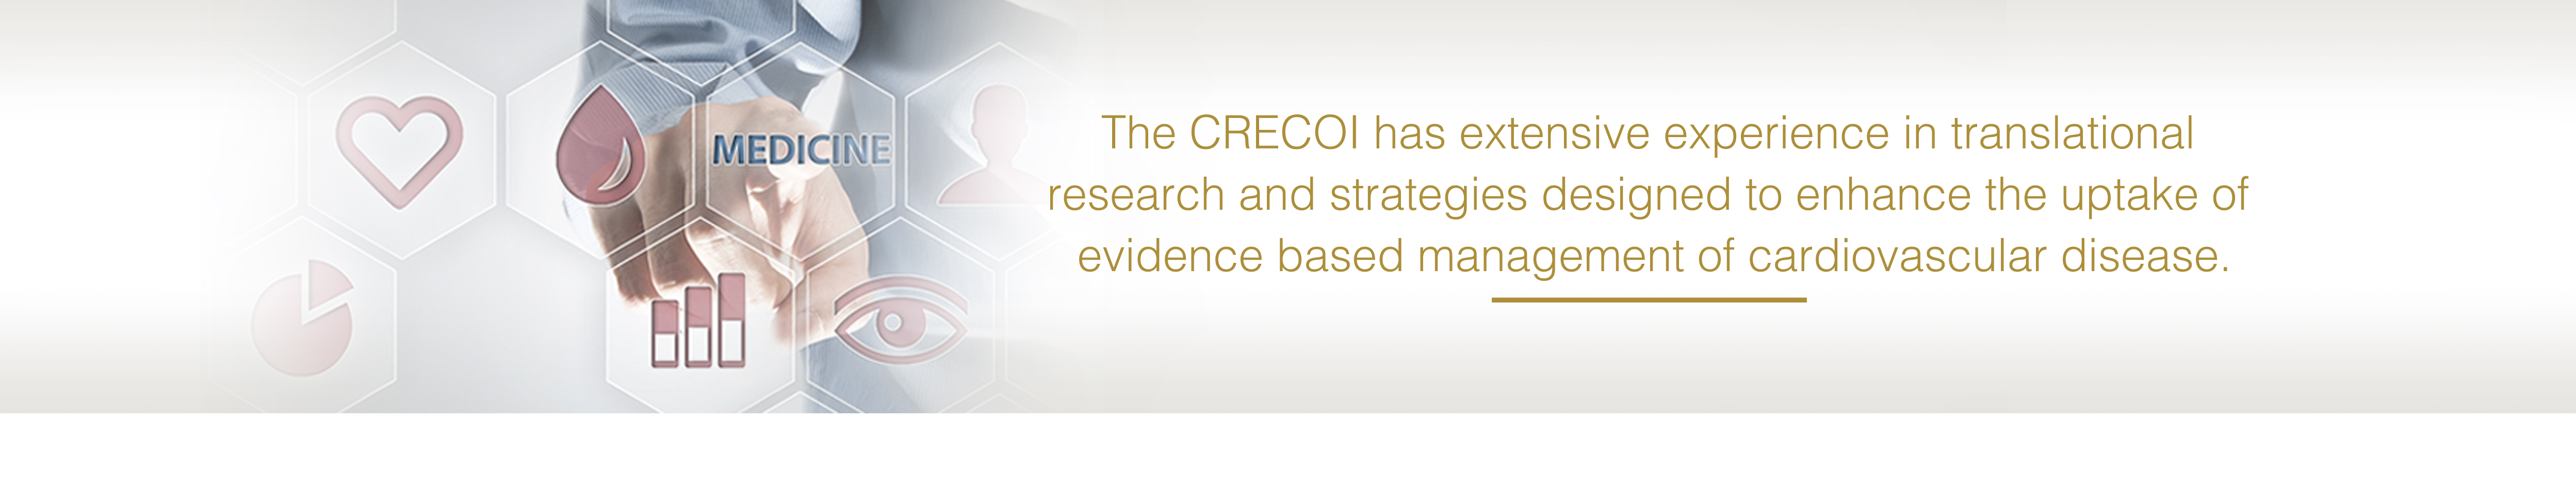 CRECOI_Evidence_Based